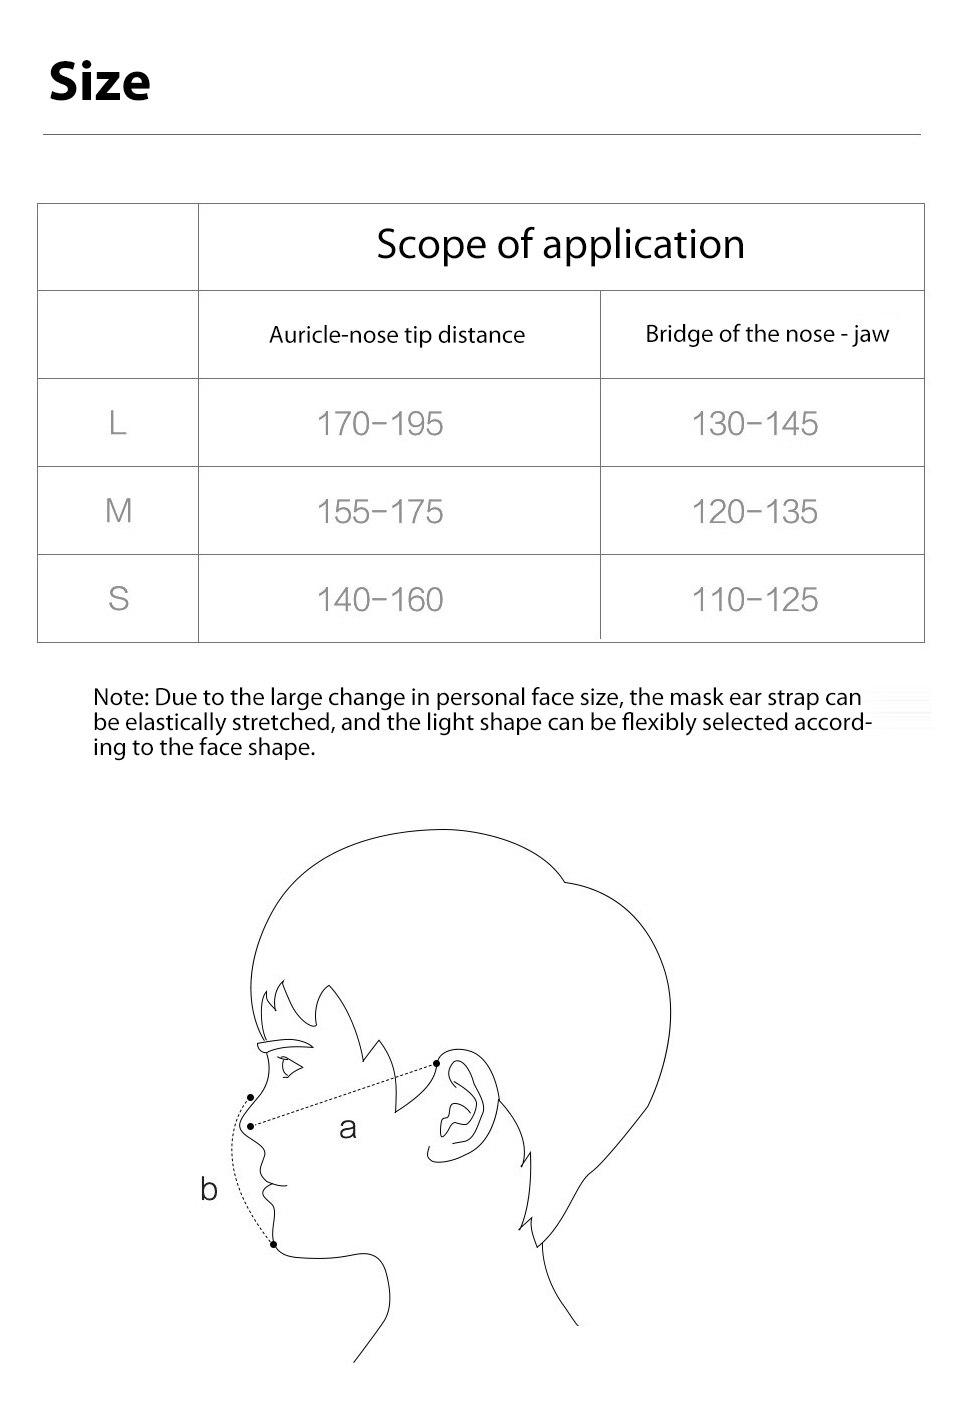 Xiaomi Mijia Smartmi Filter Mask Block 97% PM 2.5 with Ventilating Valve Long-lasting TPU Material 3 PCS Filter Mask Smart Home (14)